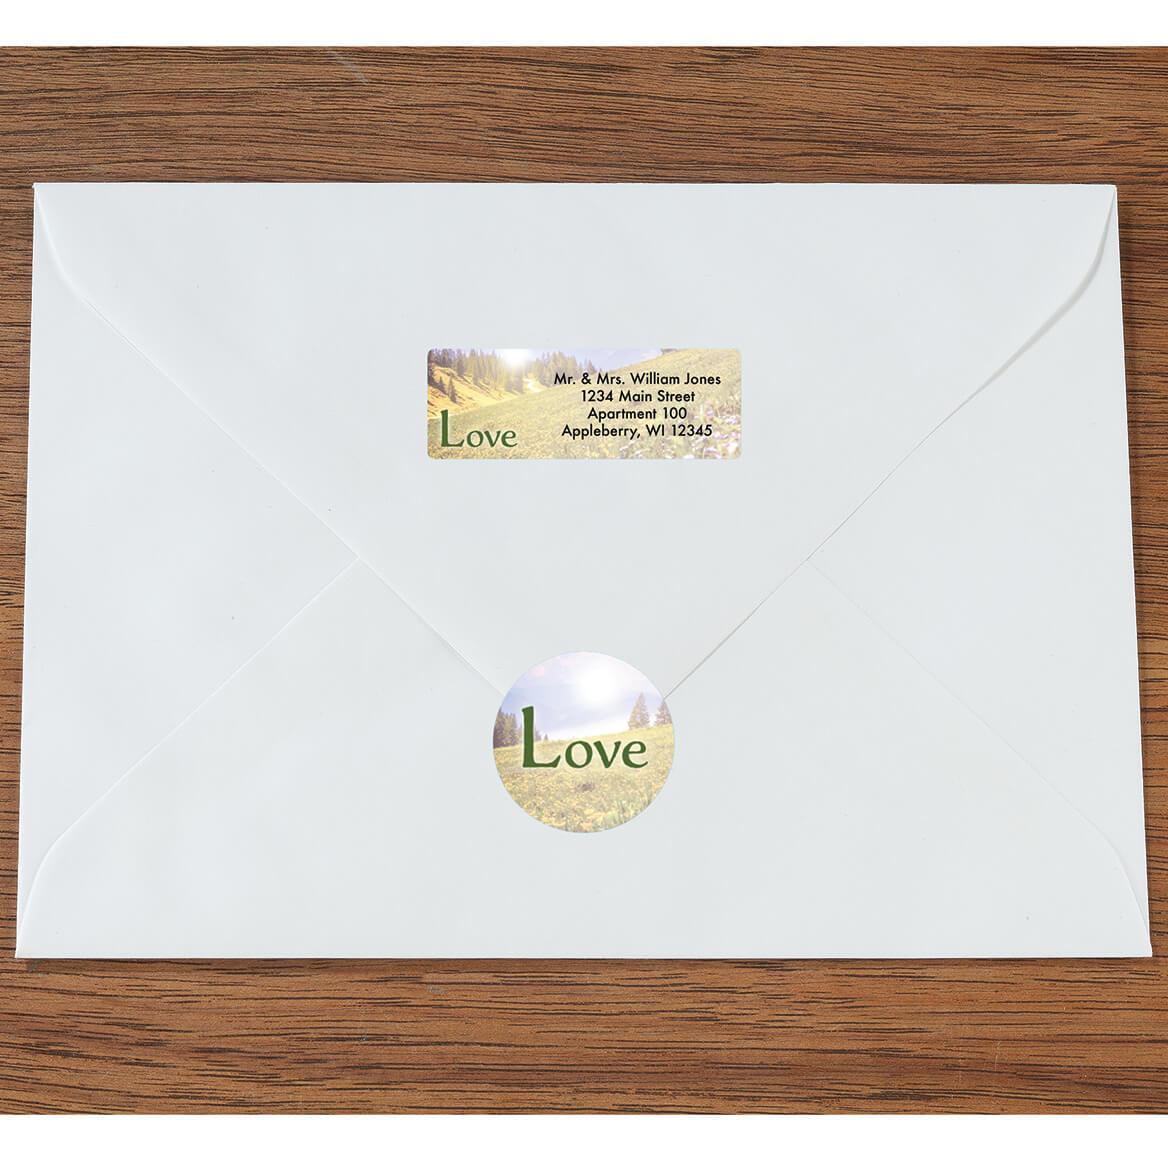 Personalized Faith Labels & Seals 60-365589